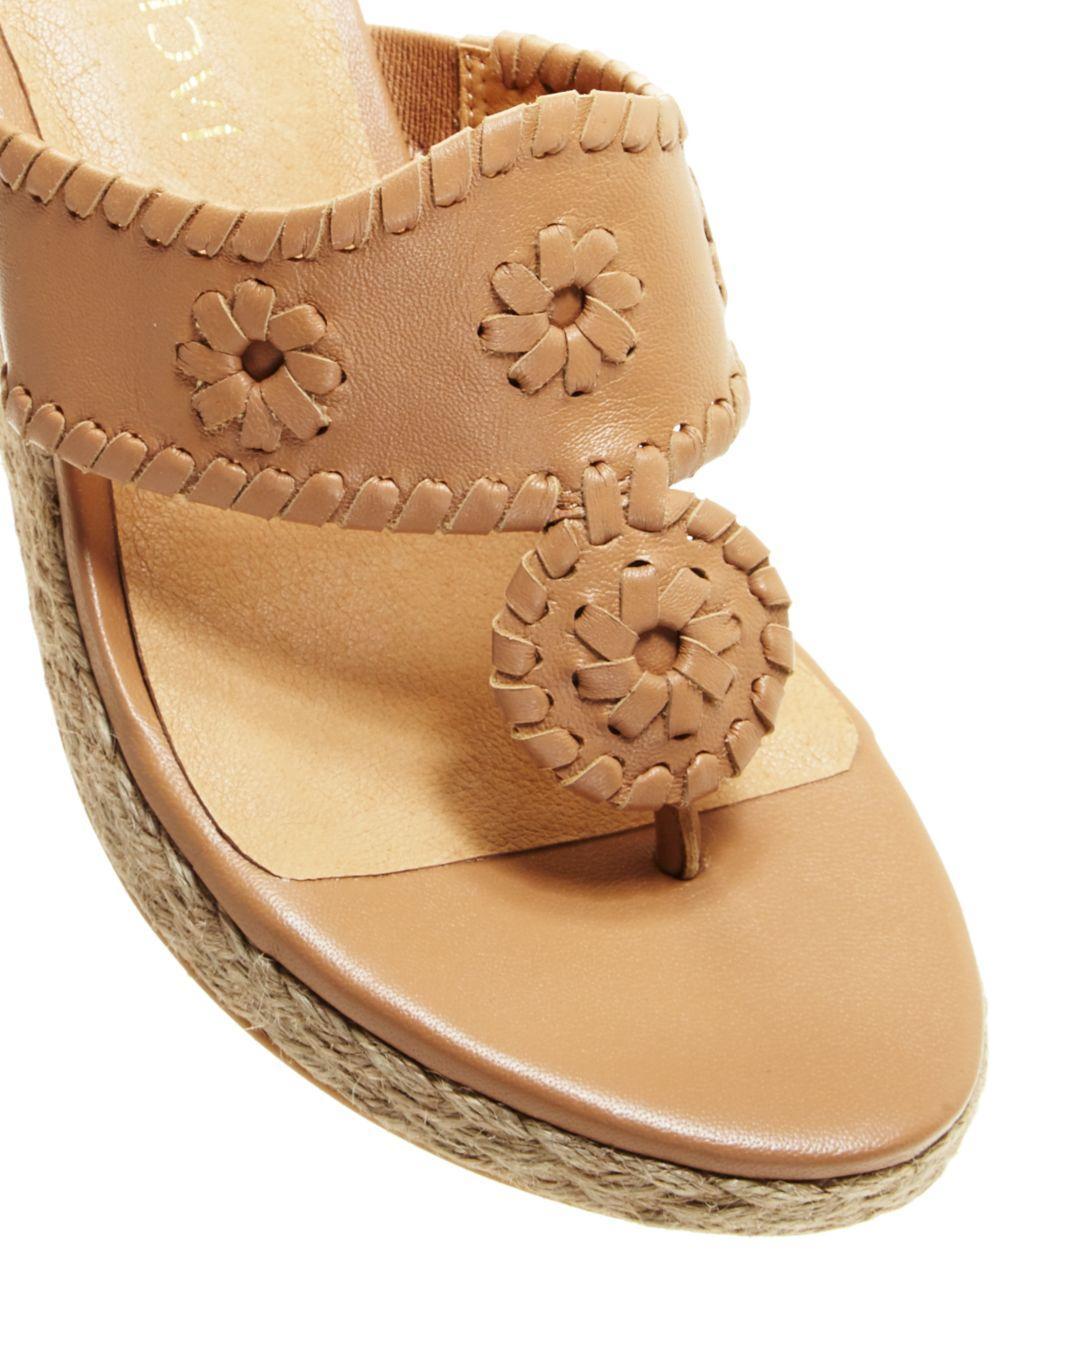 7950d9a7d Jack Rogers - Multicolor Women s Jacks Espadrille Wedge Sandals - Lyst.  View fullscreen